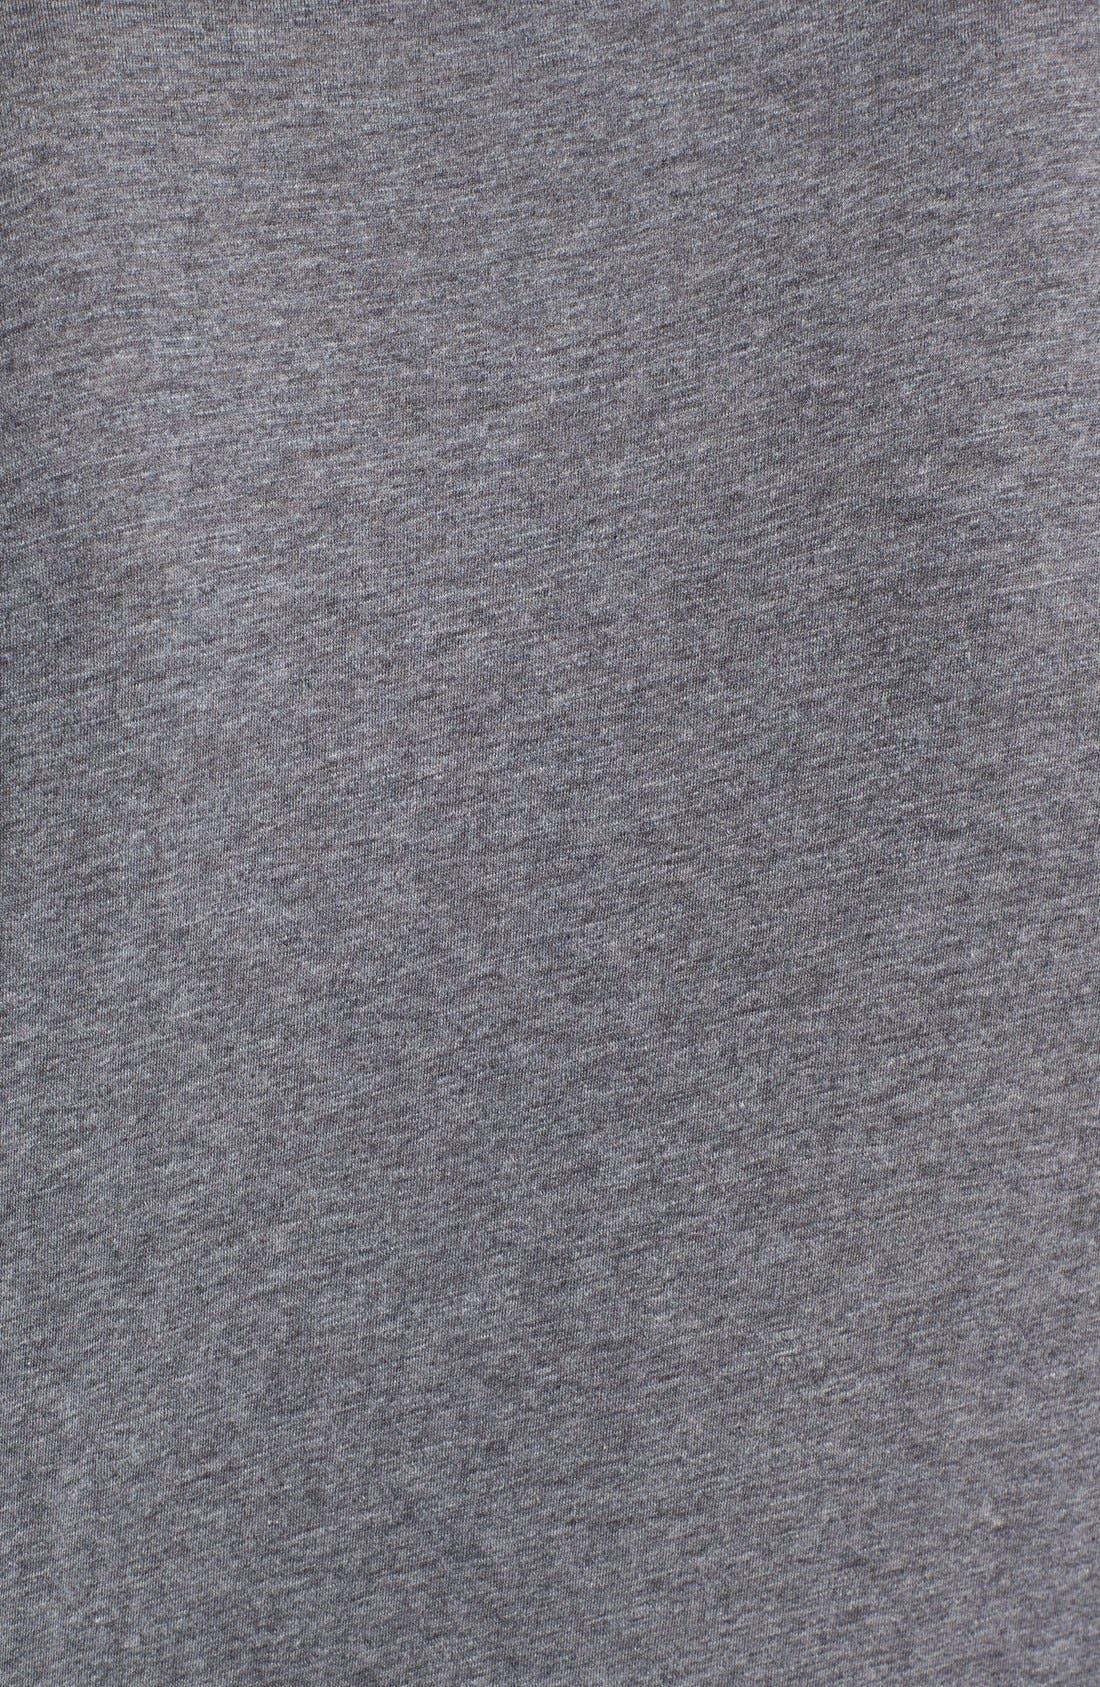 Alternate Image 3  - Michael Kors Camo Pocket Slub T-Shirt